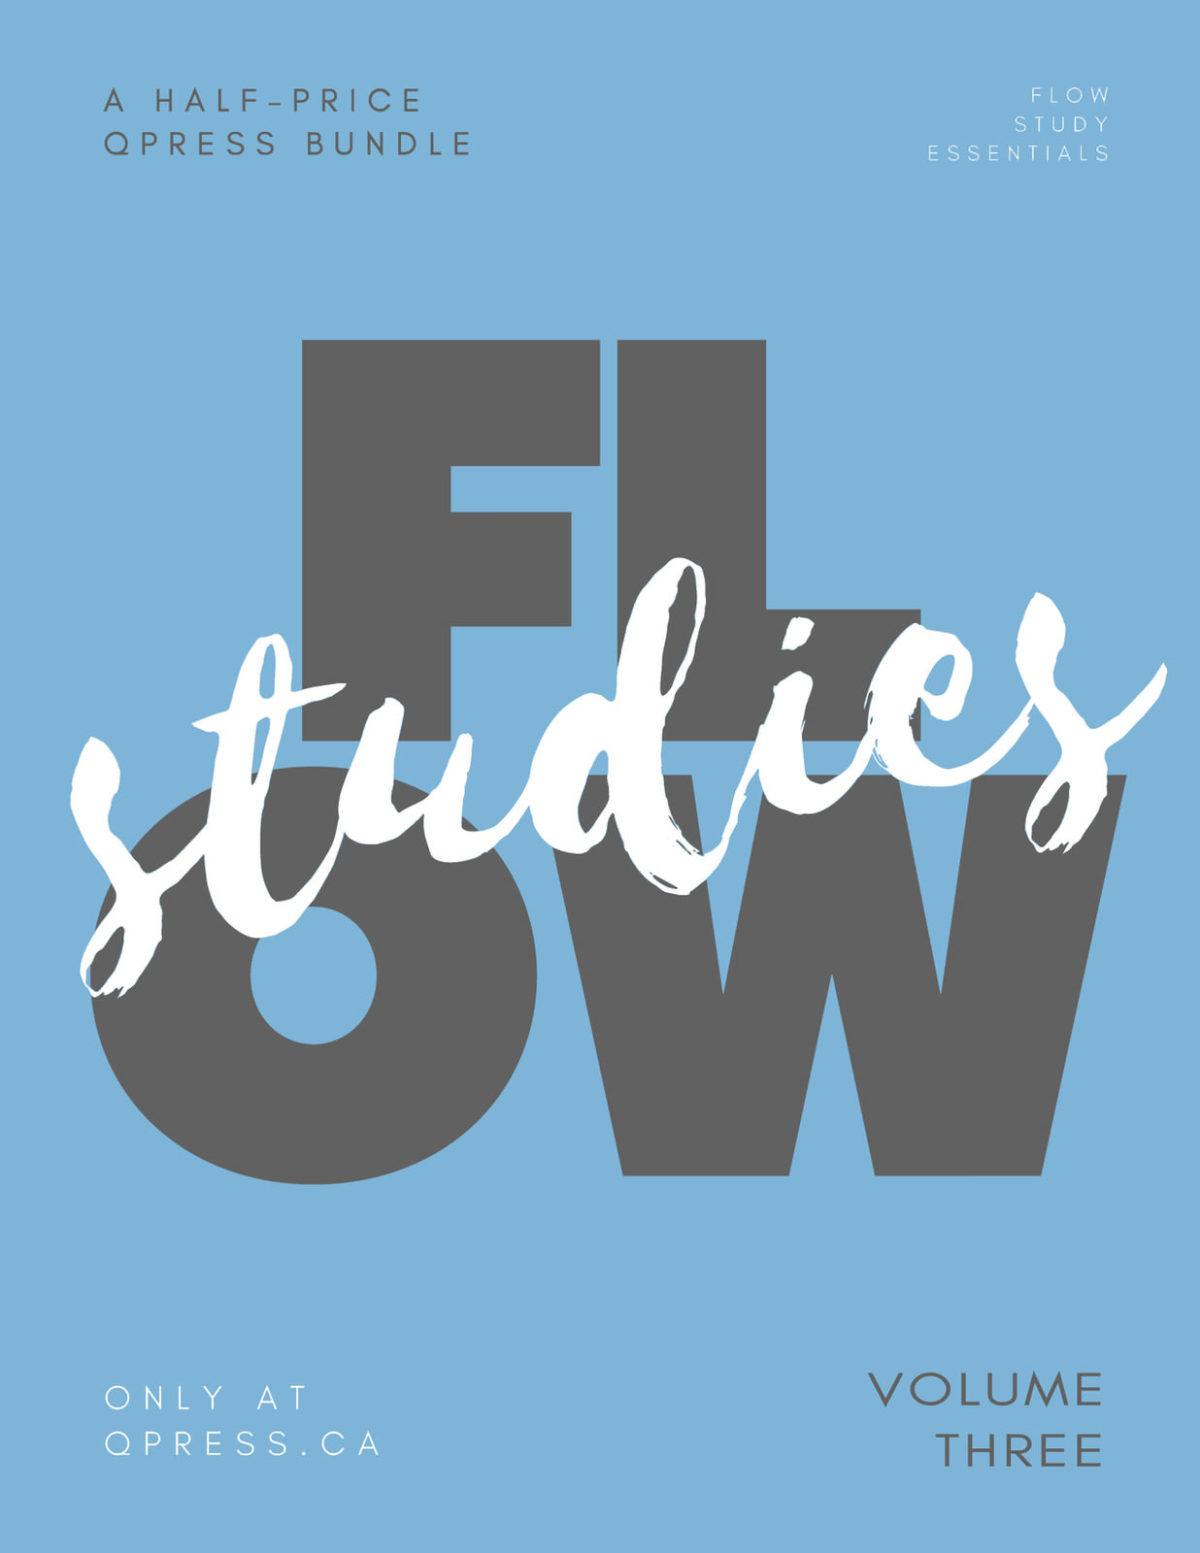 Flow Study Essentials Cover Vol.3